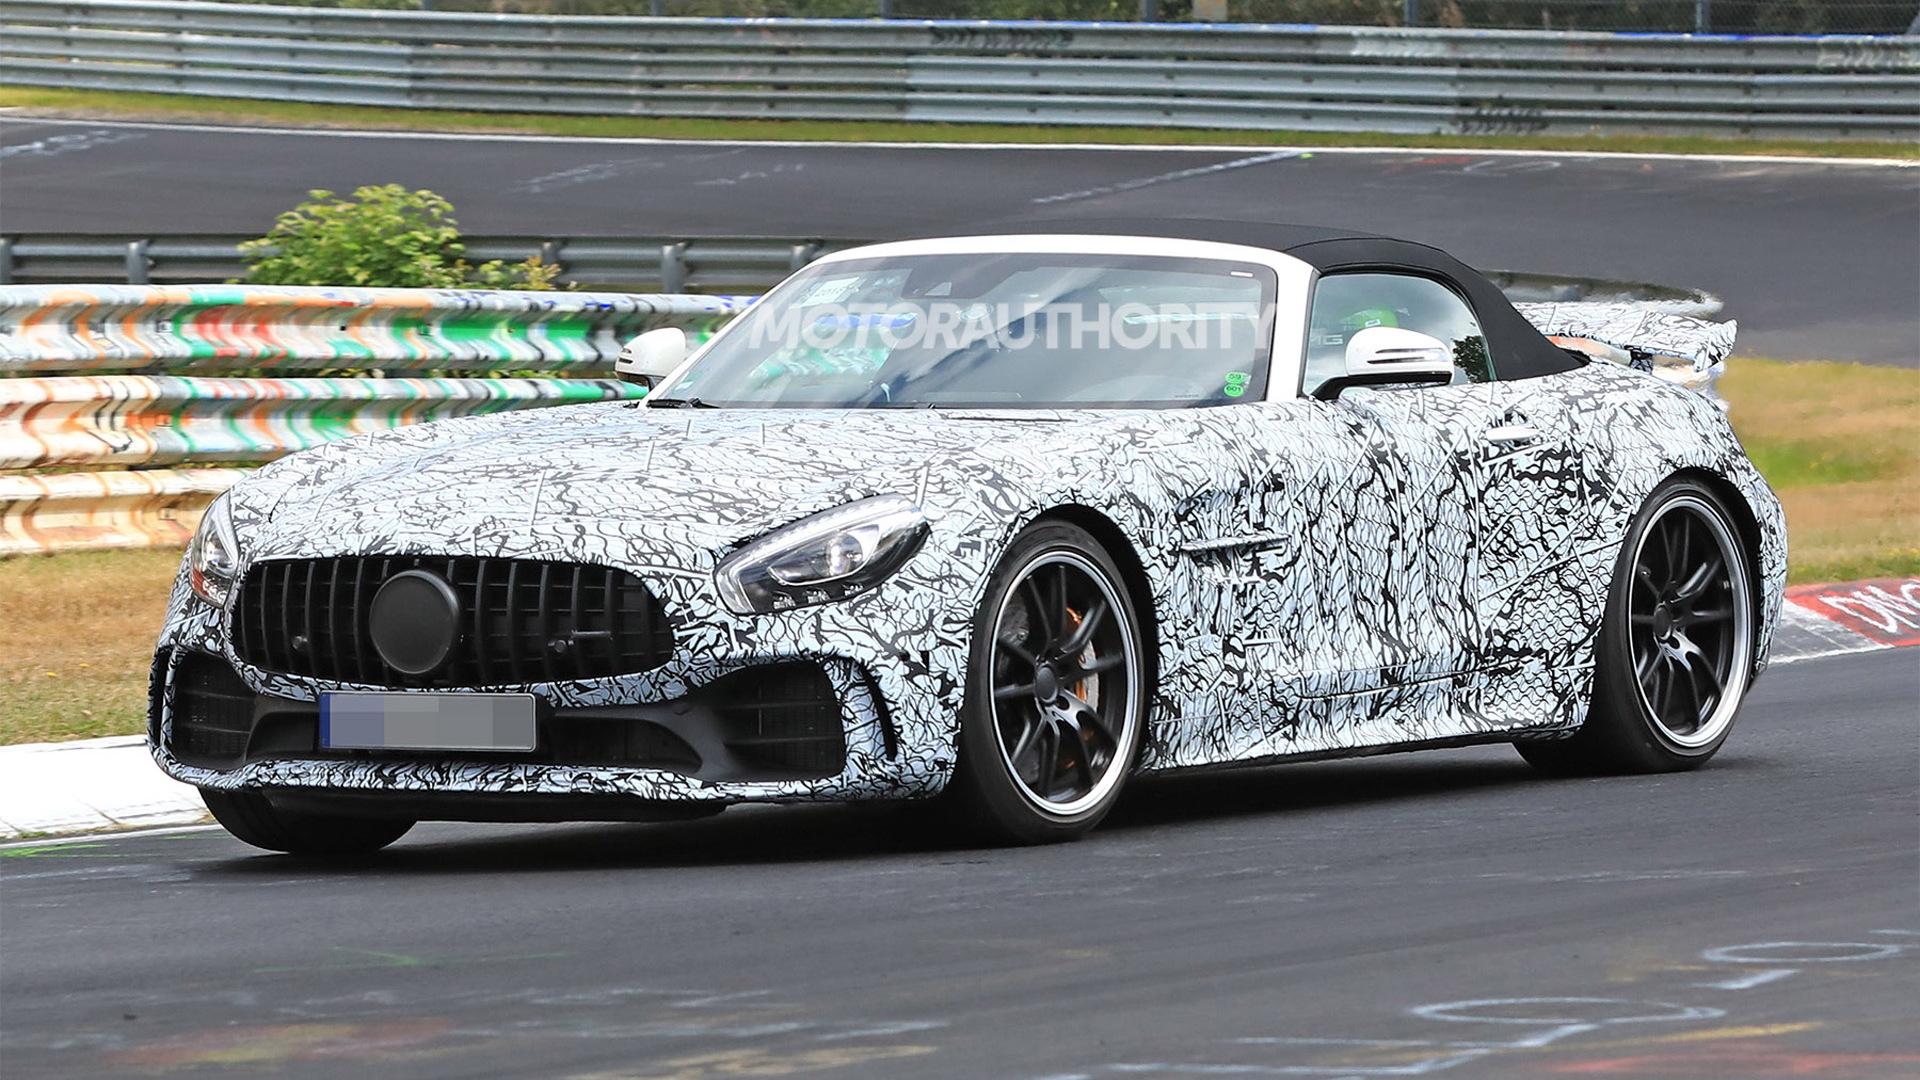 2020 Mercedes-AMG GT R Roadster spy shots - Image via S. Baldauf/SB-Medien